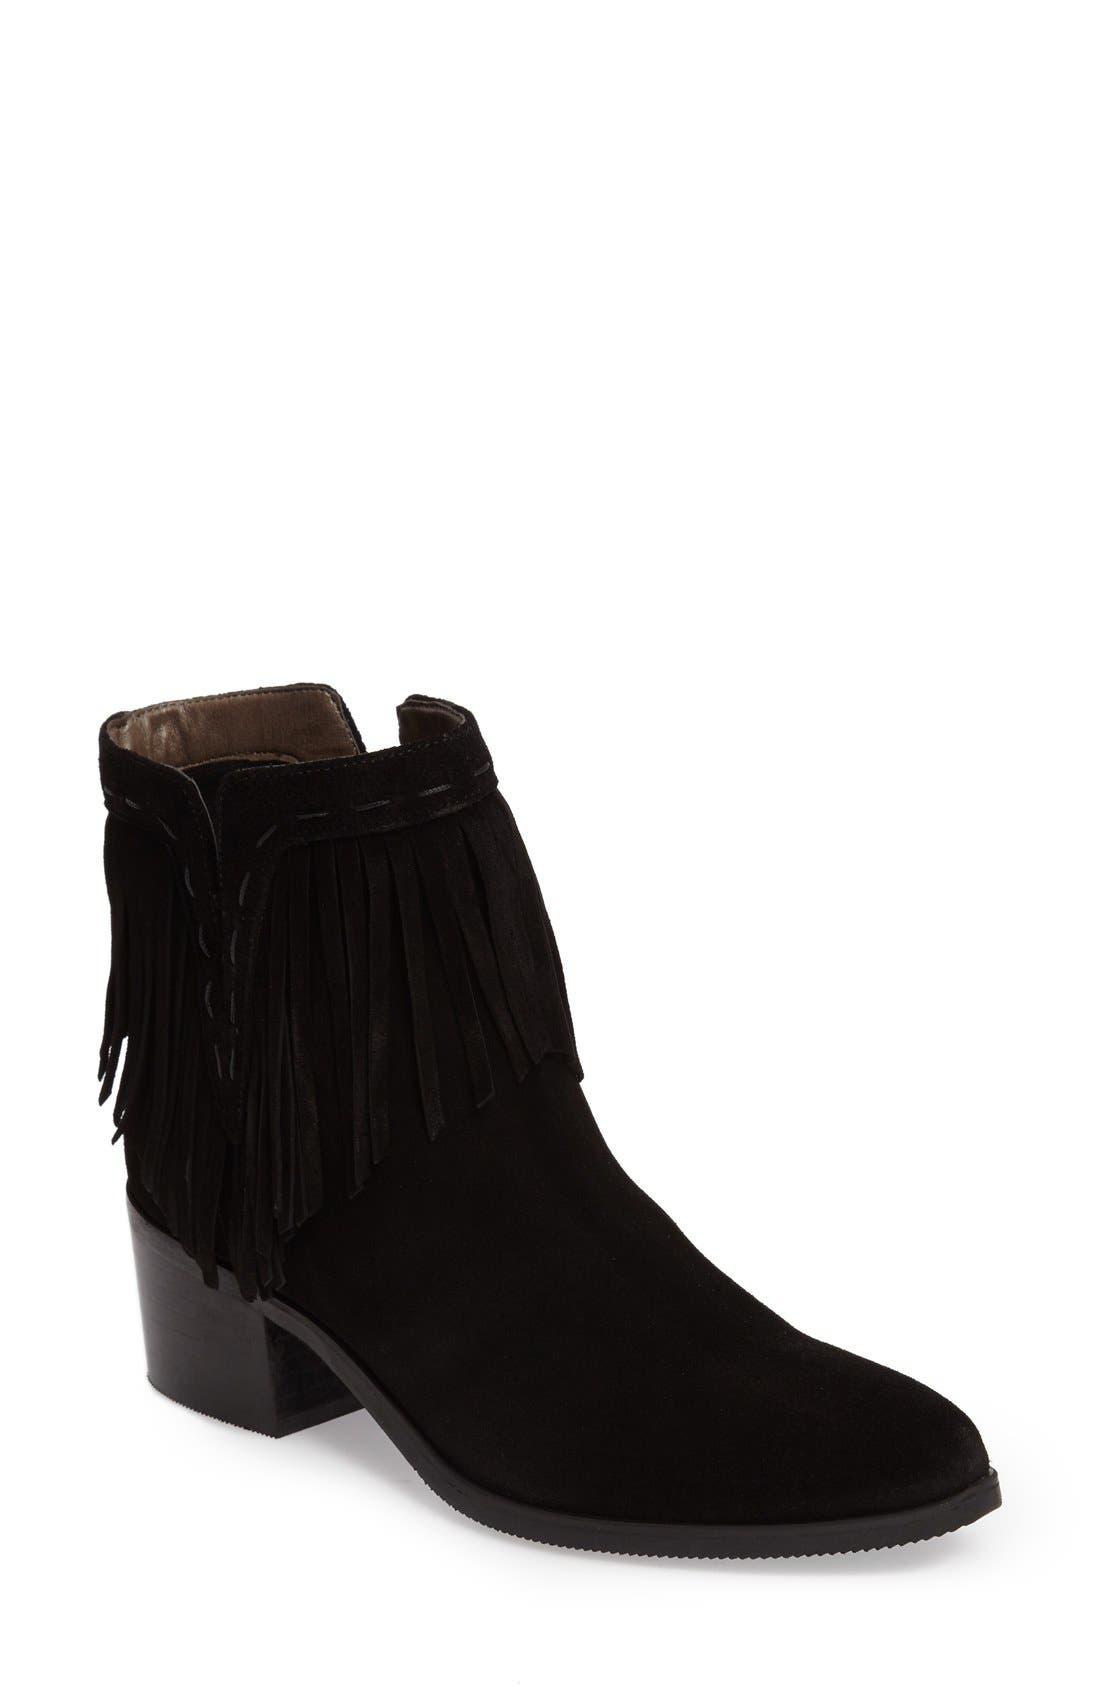 Tex Fringe Block Heel Bootie,                         Main,                         color, Black Suede